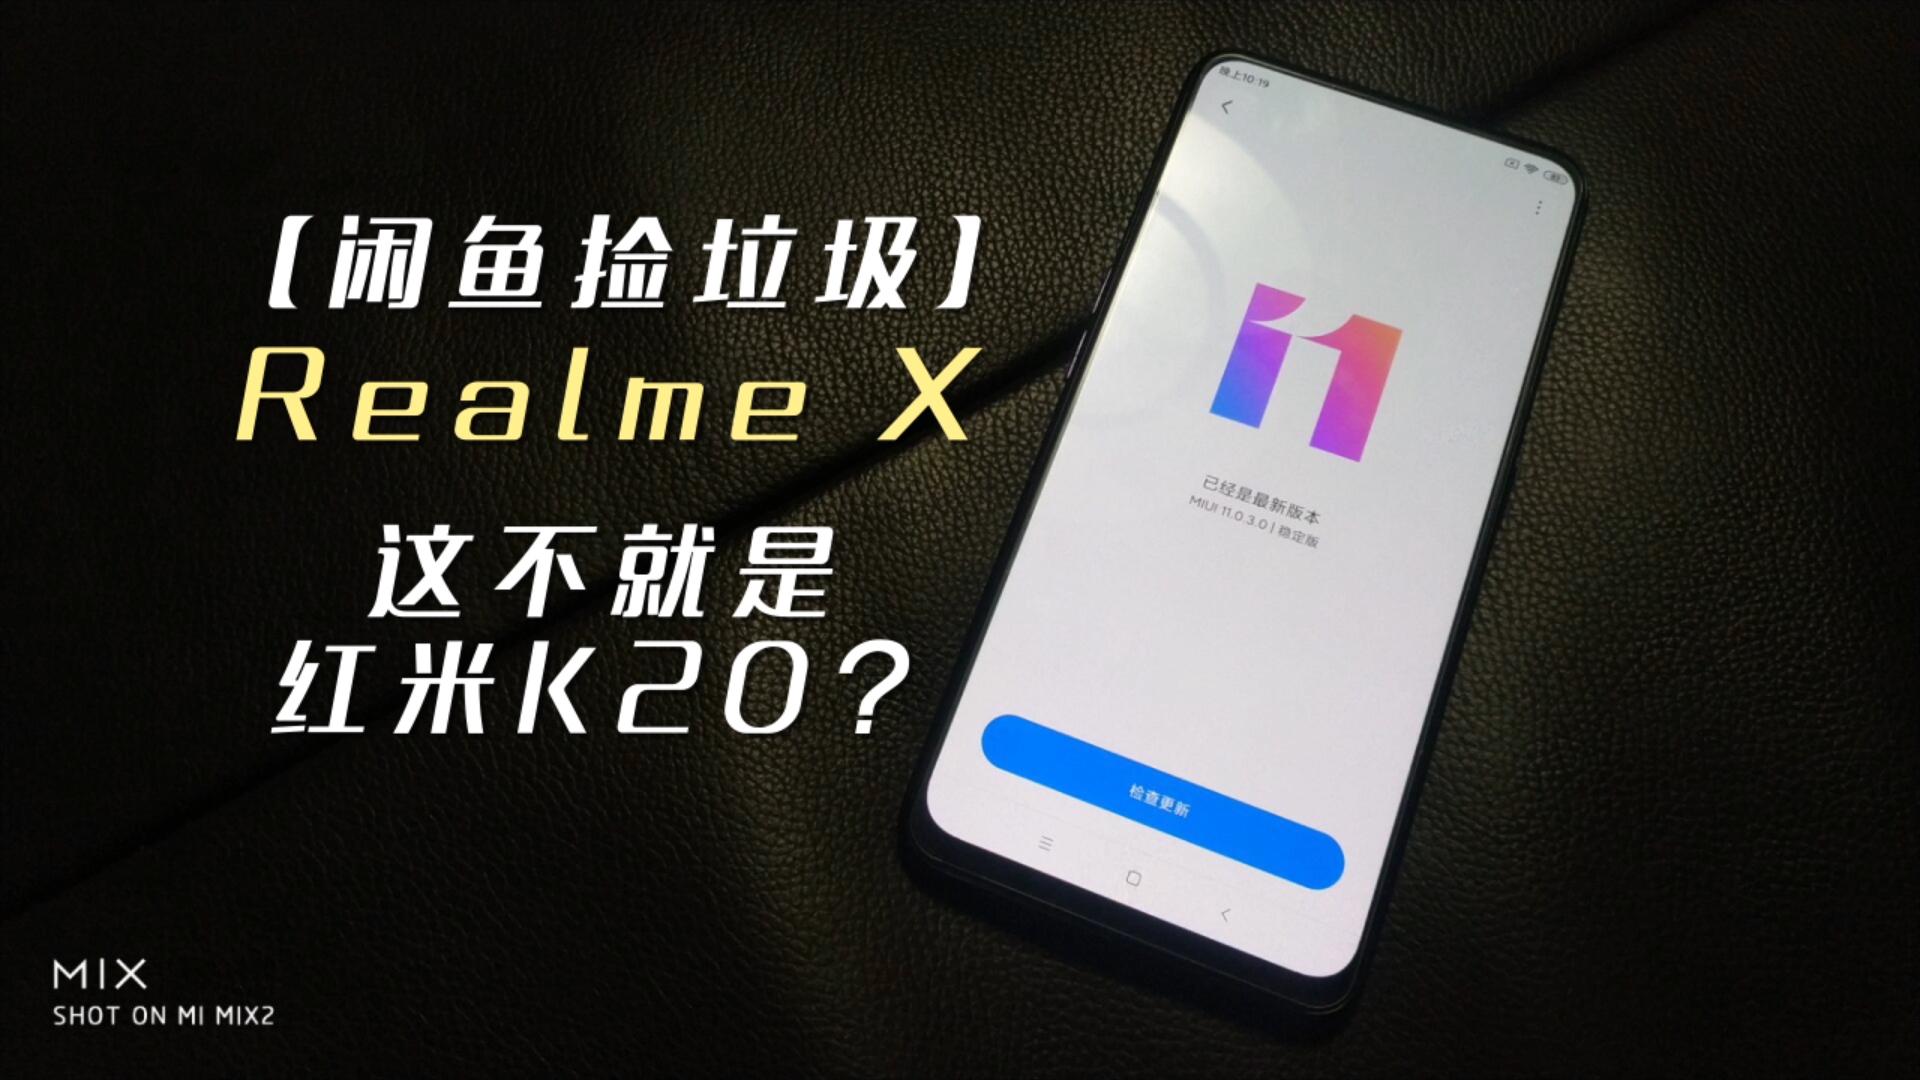 Realme X 开箱!这不就是红米K20吗?